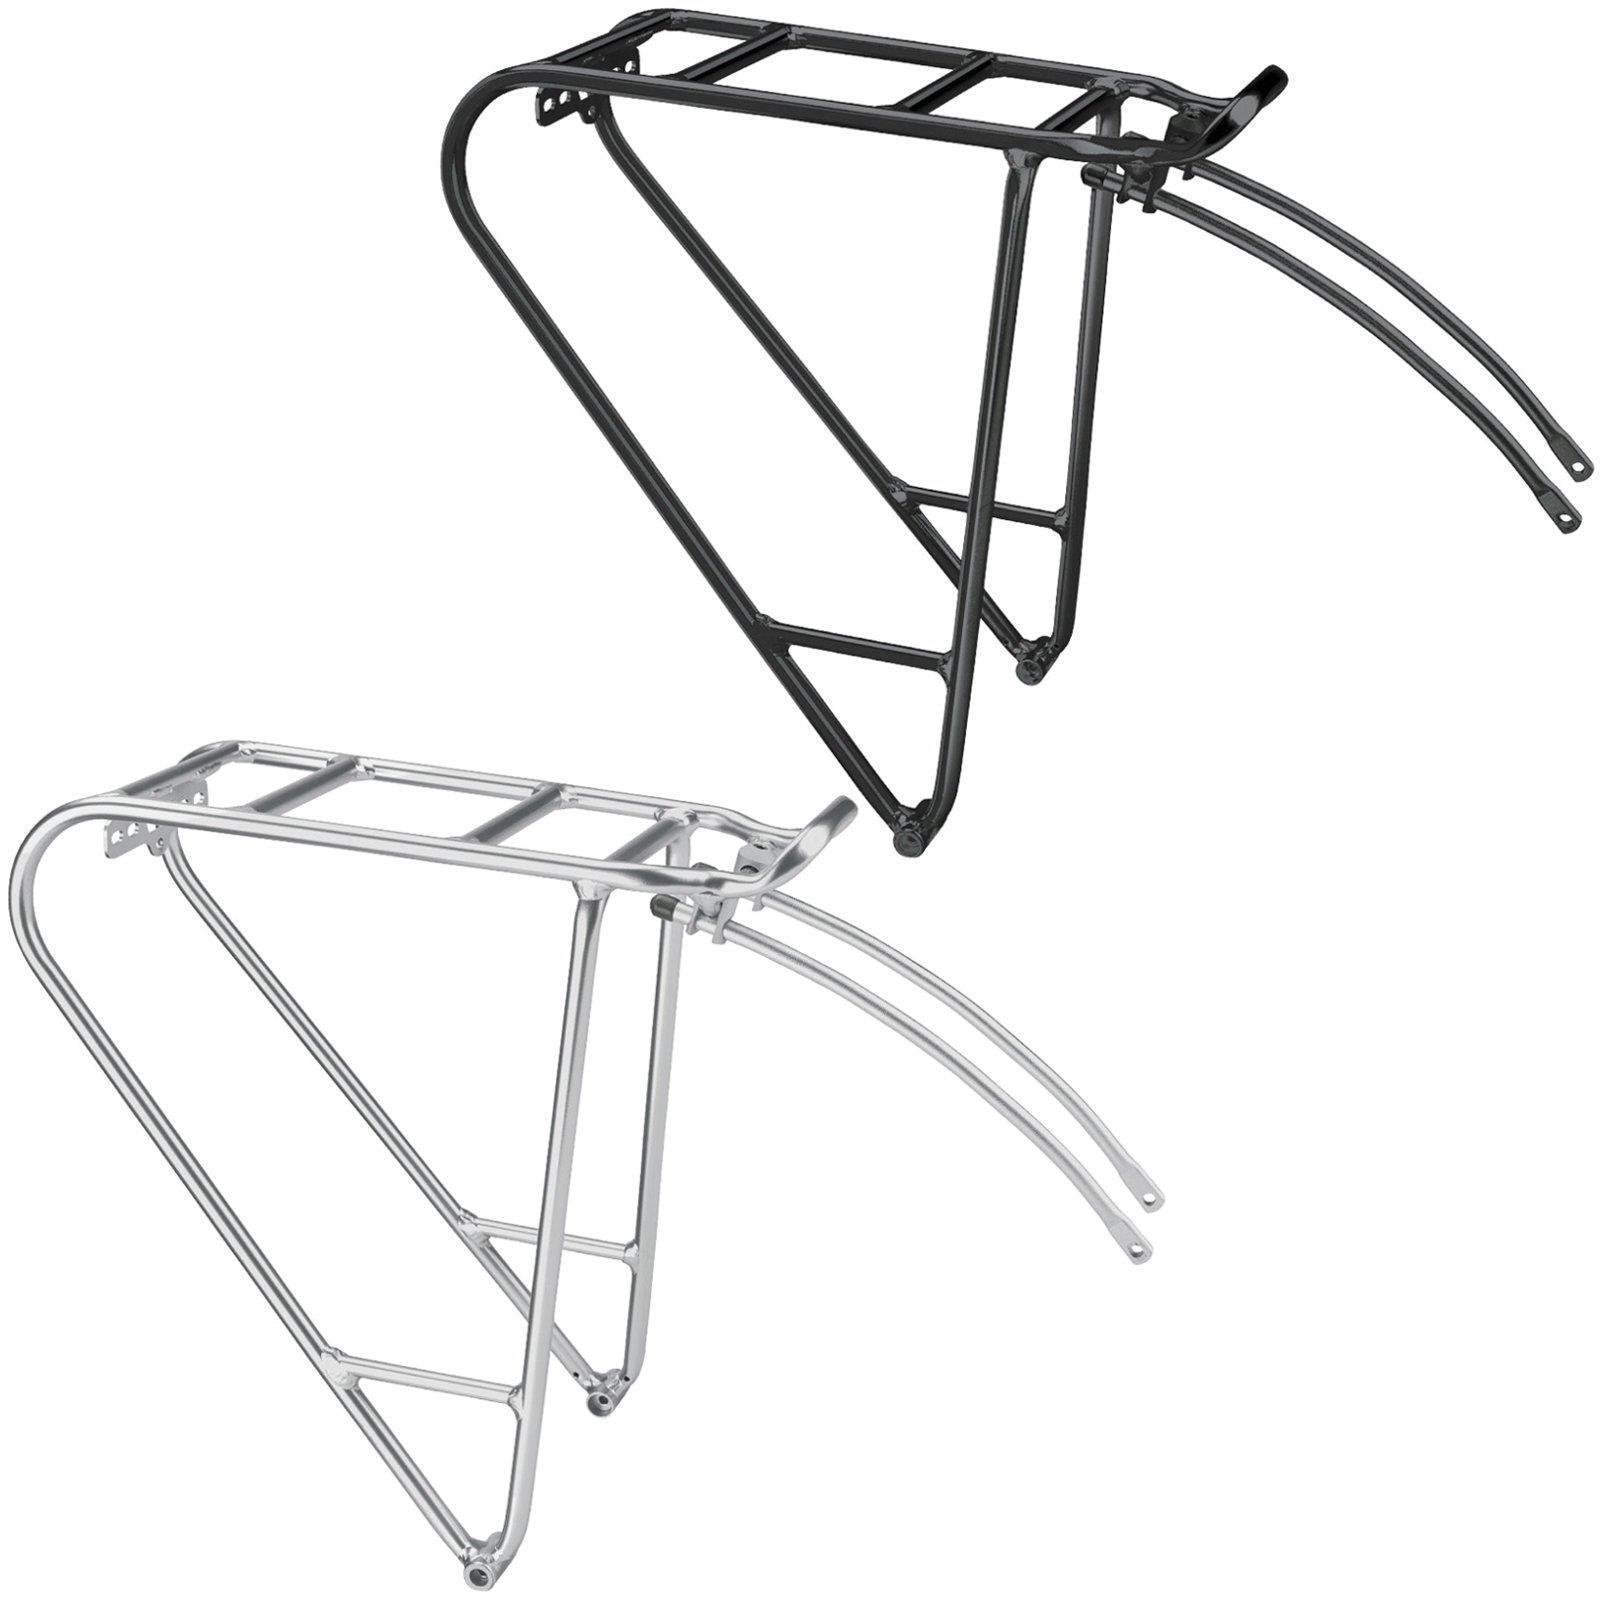 Electra Compatible Fahrrad Gepäckträger Hinten Alloy Rack 26 Zoll City Bike